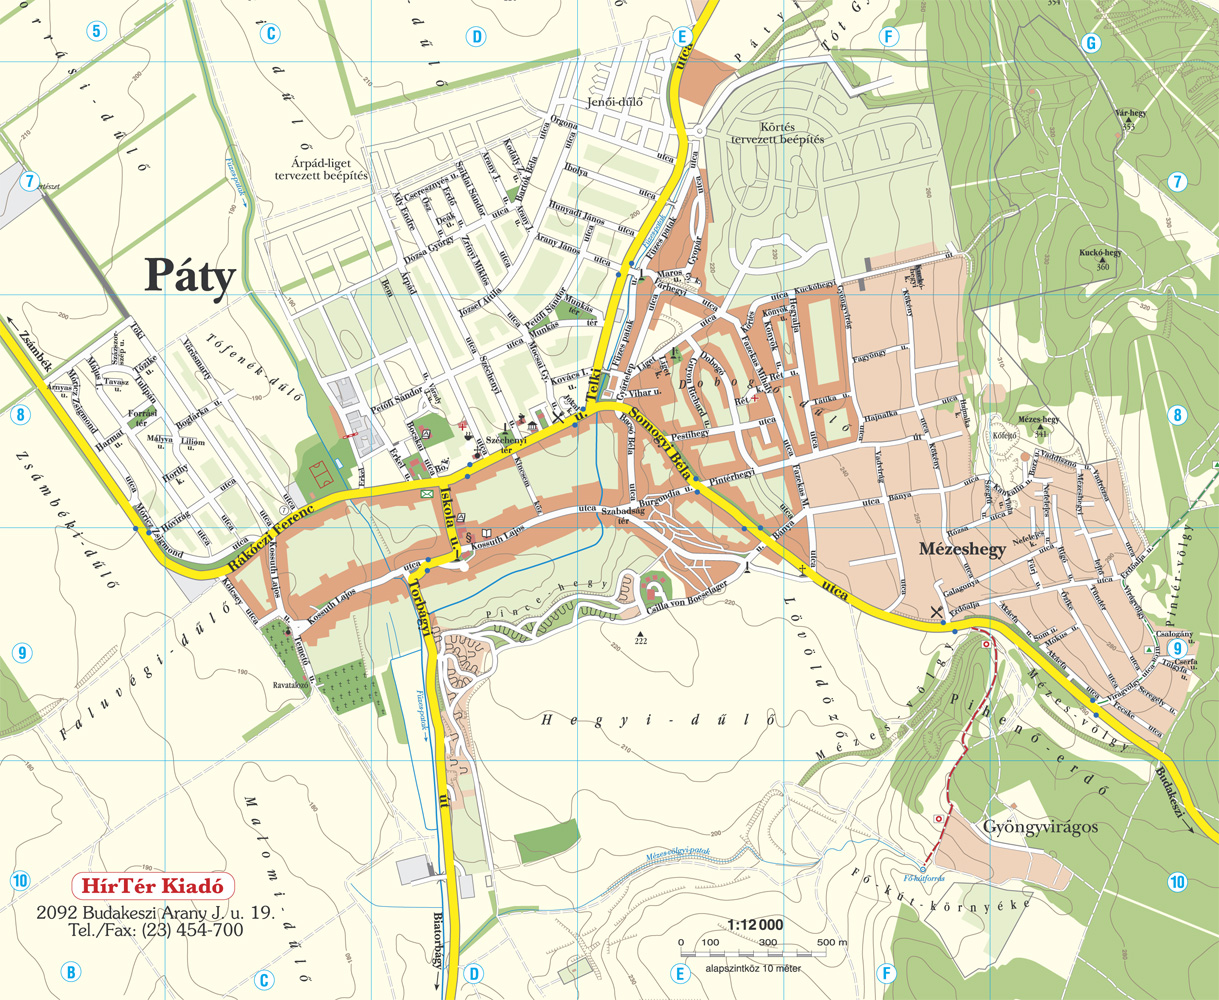 budakeszi térkép Térképek budakeszi térkép